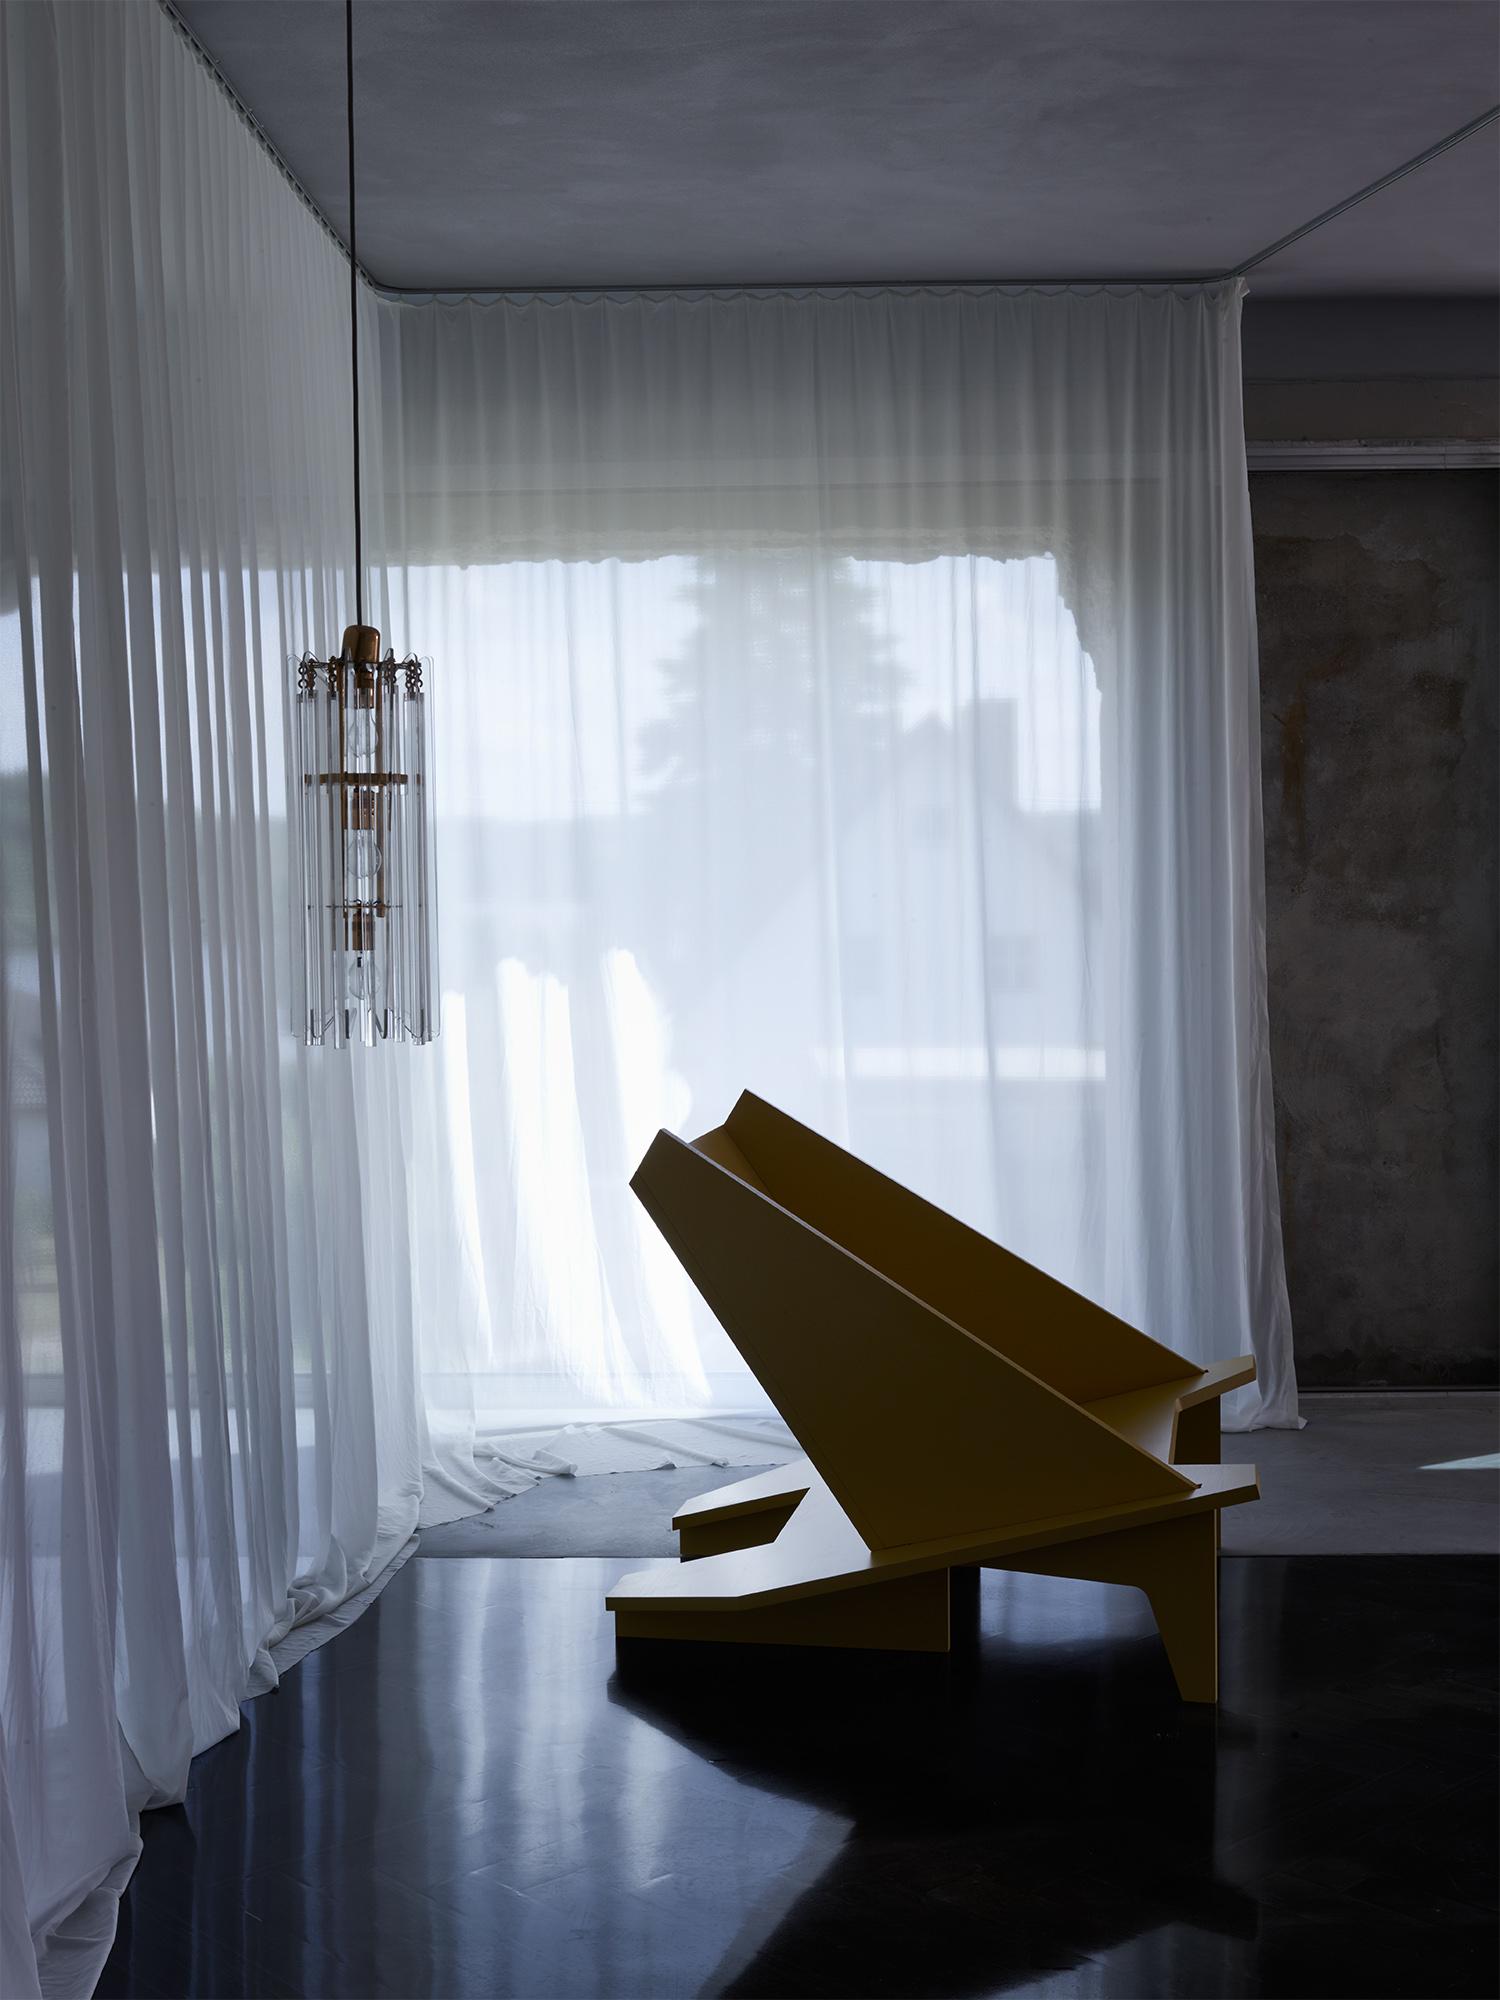 objekte-unserer-tage-3405-villa-01-takahashi-lounge-chair